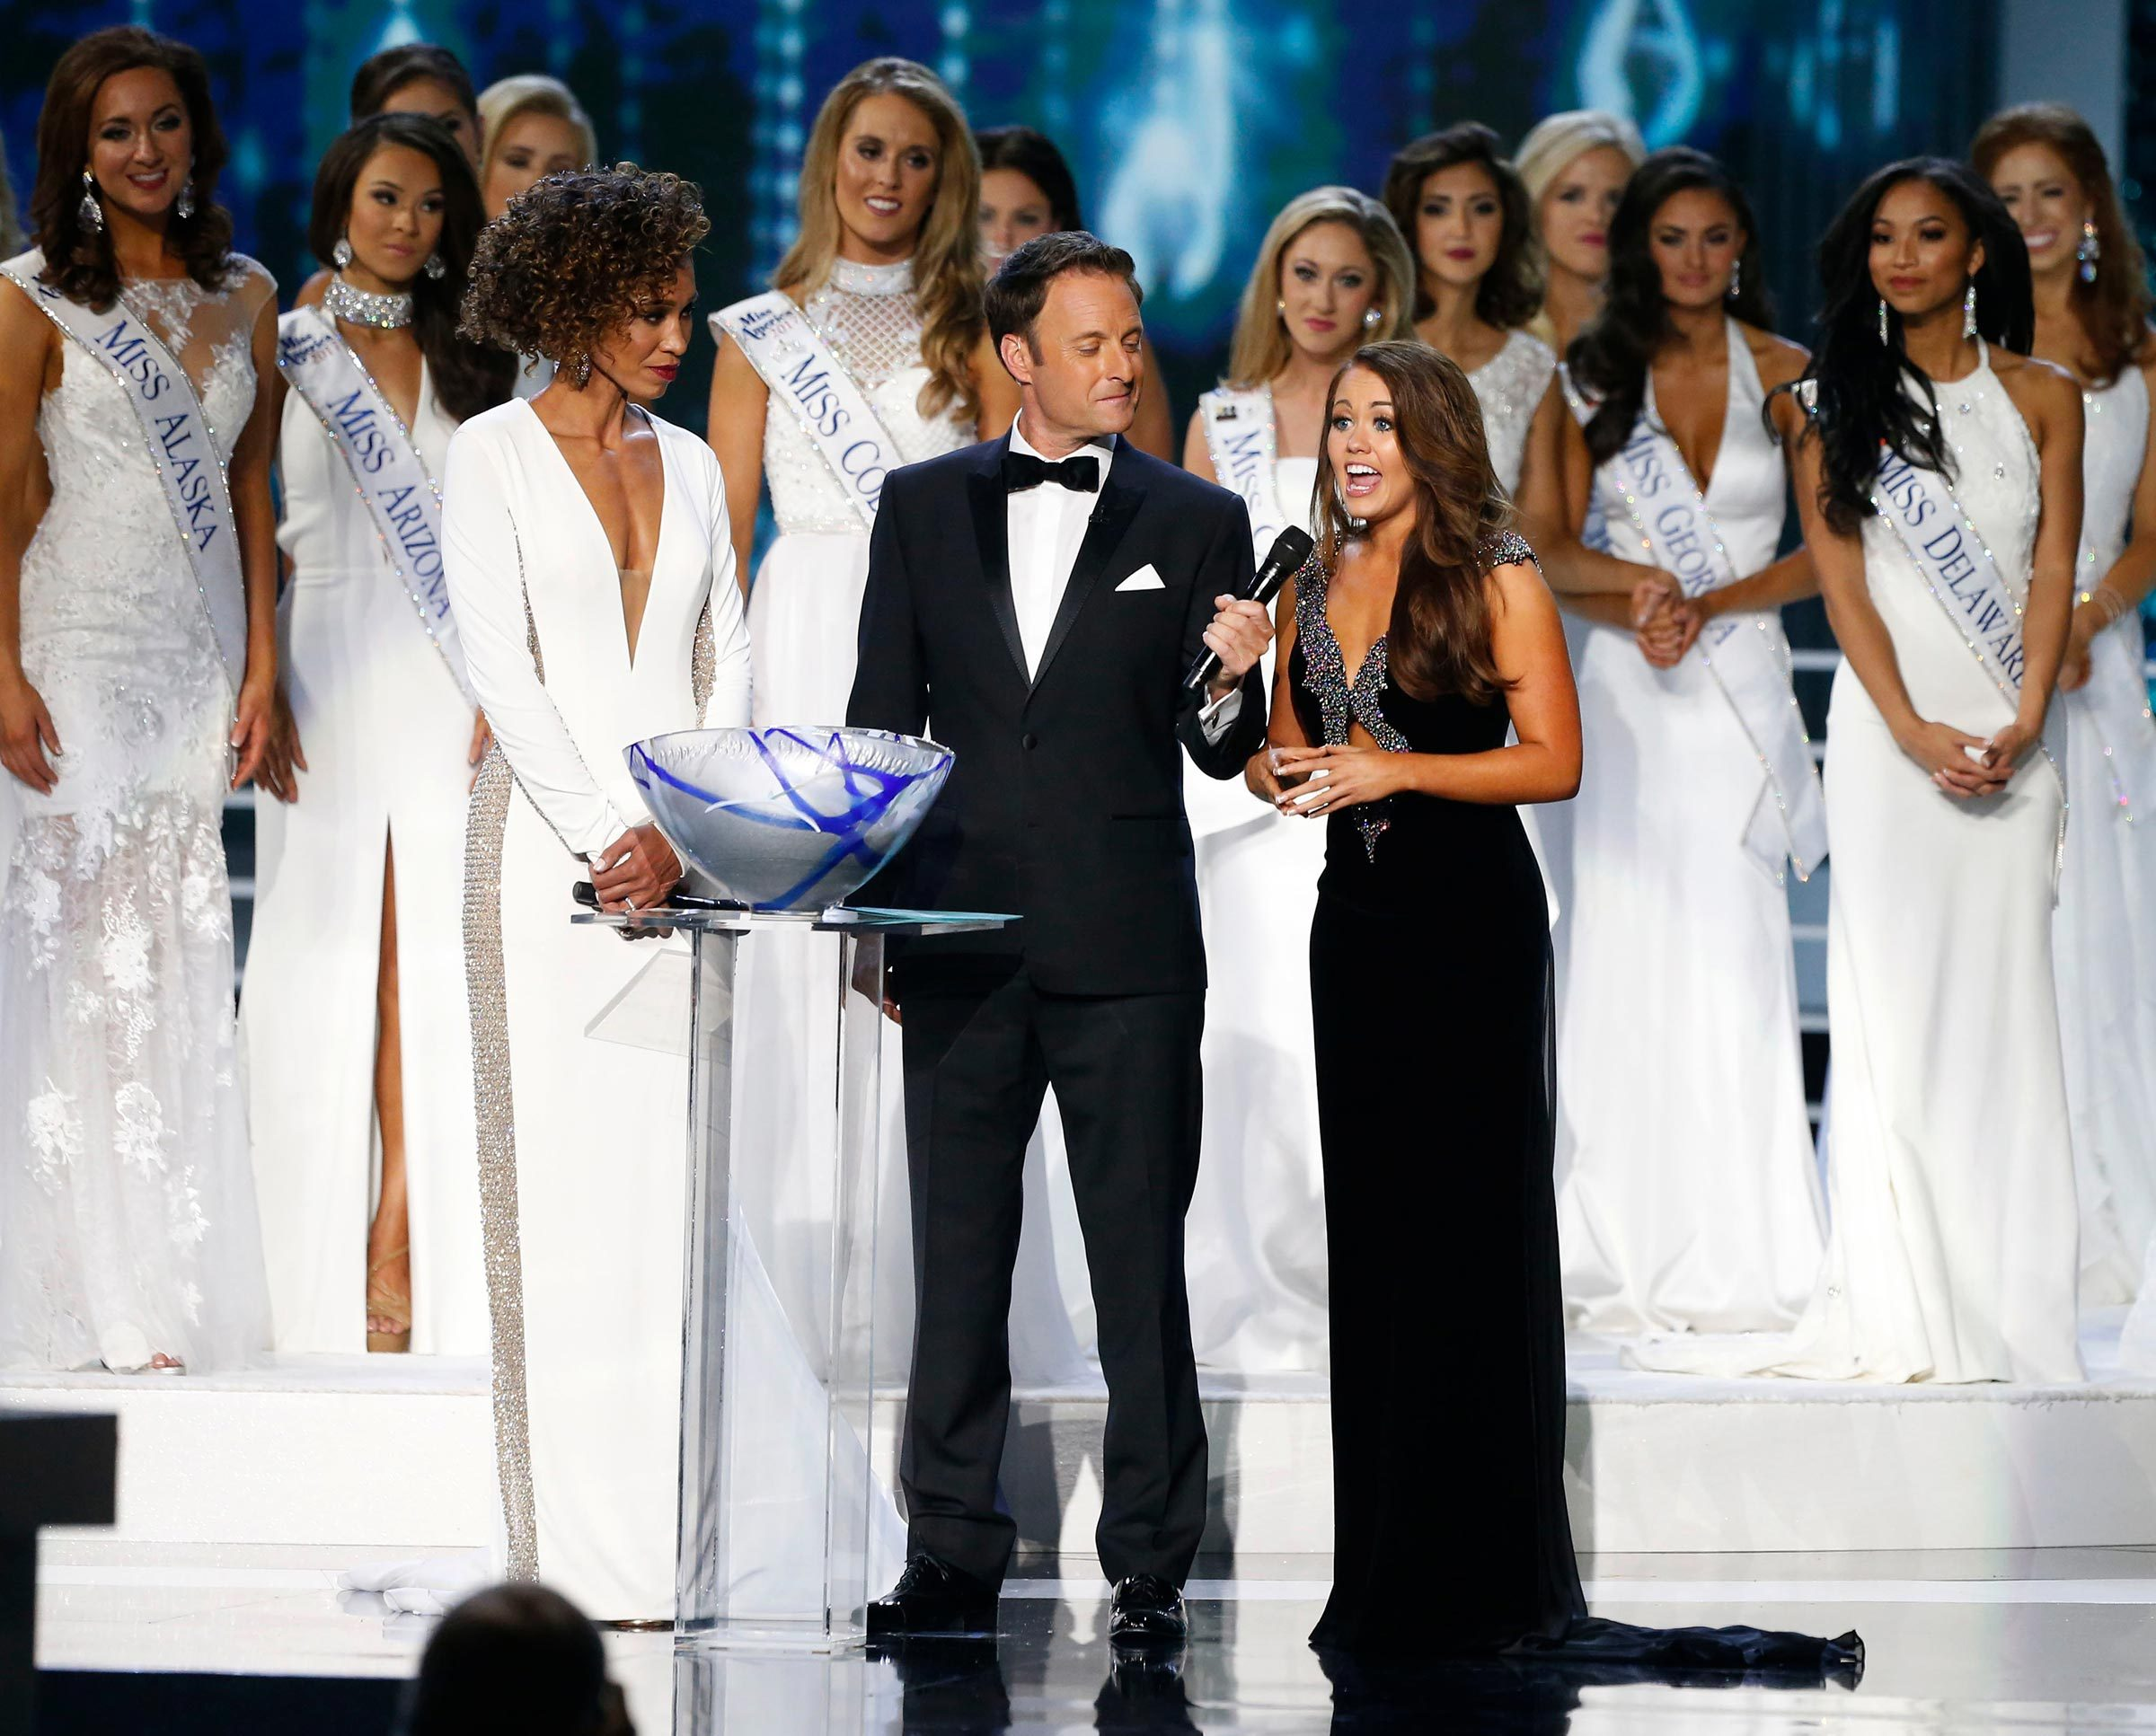 Miss America, Atlantic City, USA - 10 Sep 2017